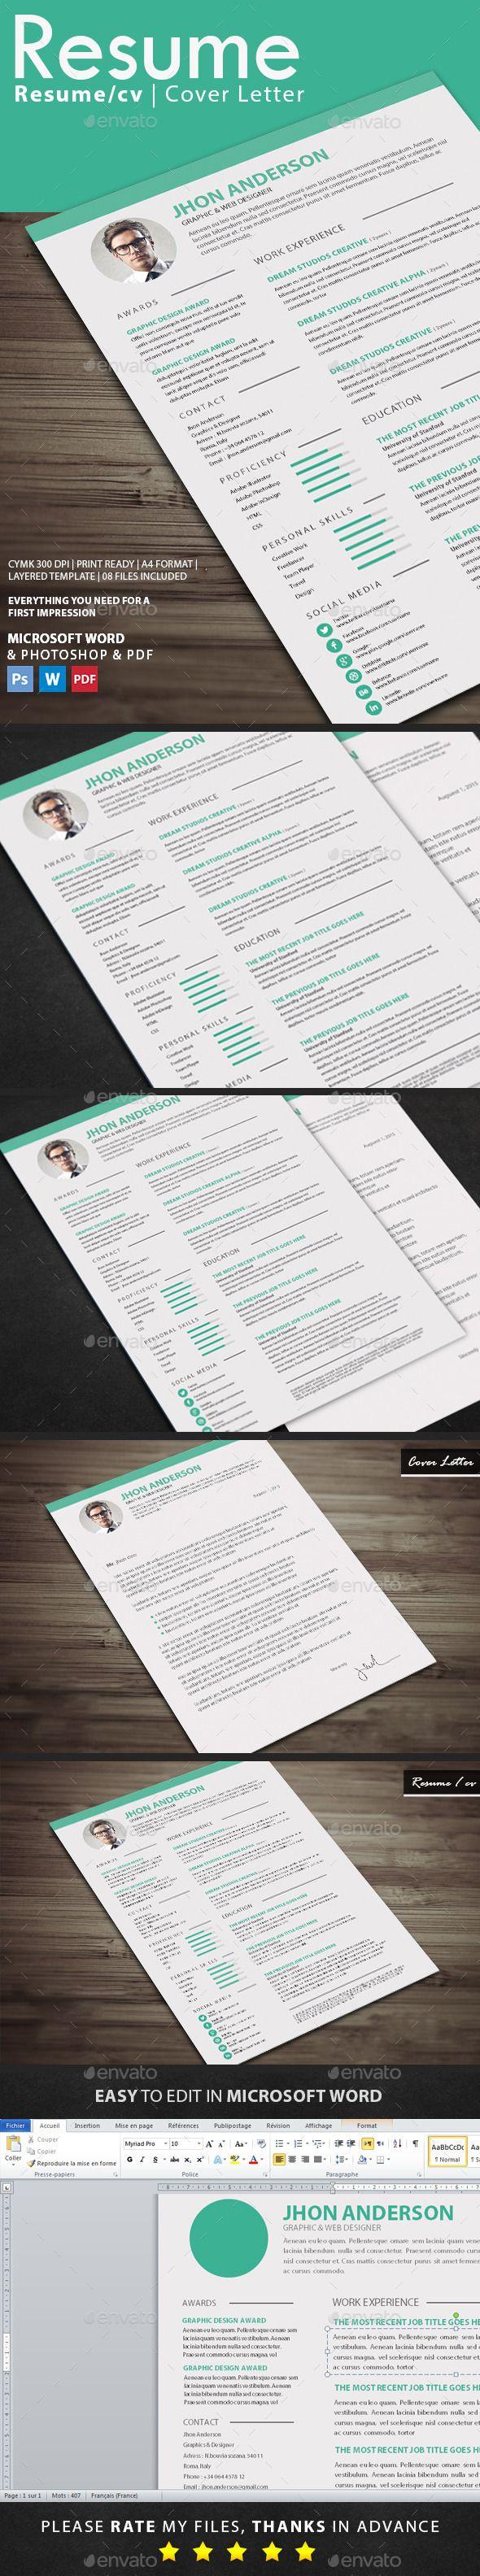 resume template download httpgraphicrivernetitemresume